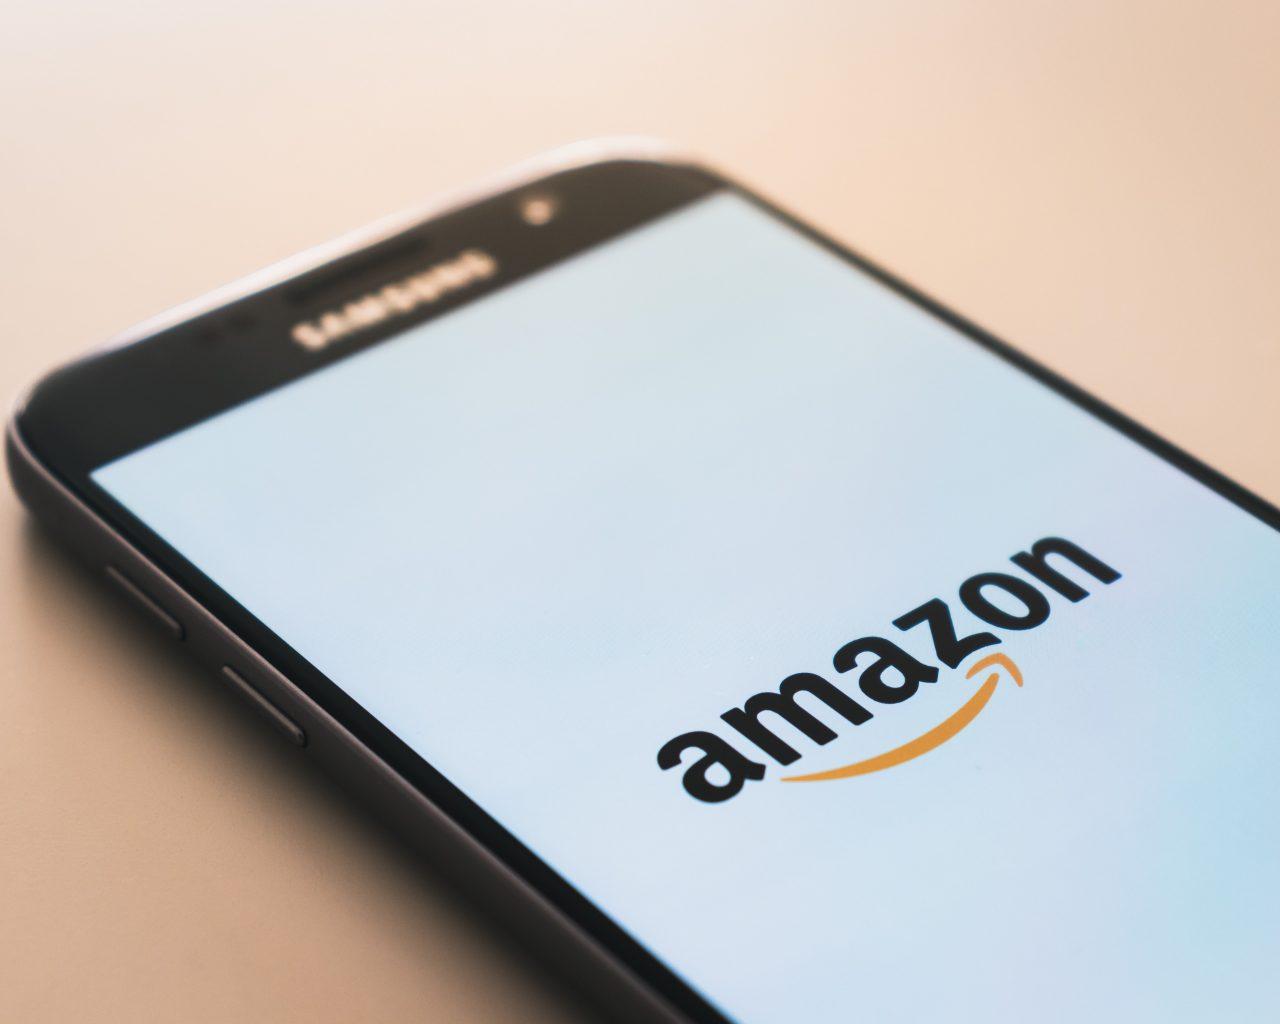 Amazon Bullet Points: 4 Surefire Ways To Improve Your Amazon Product Listing 1